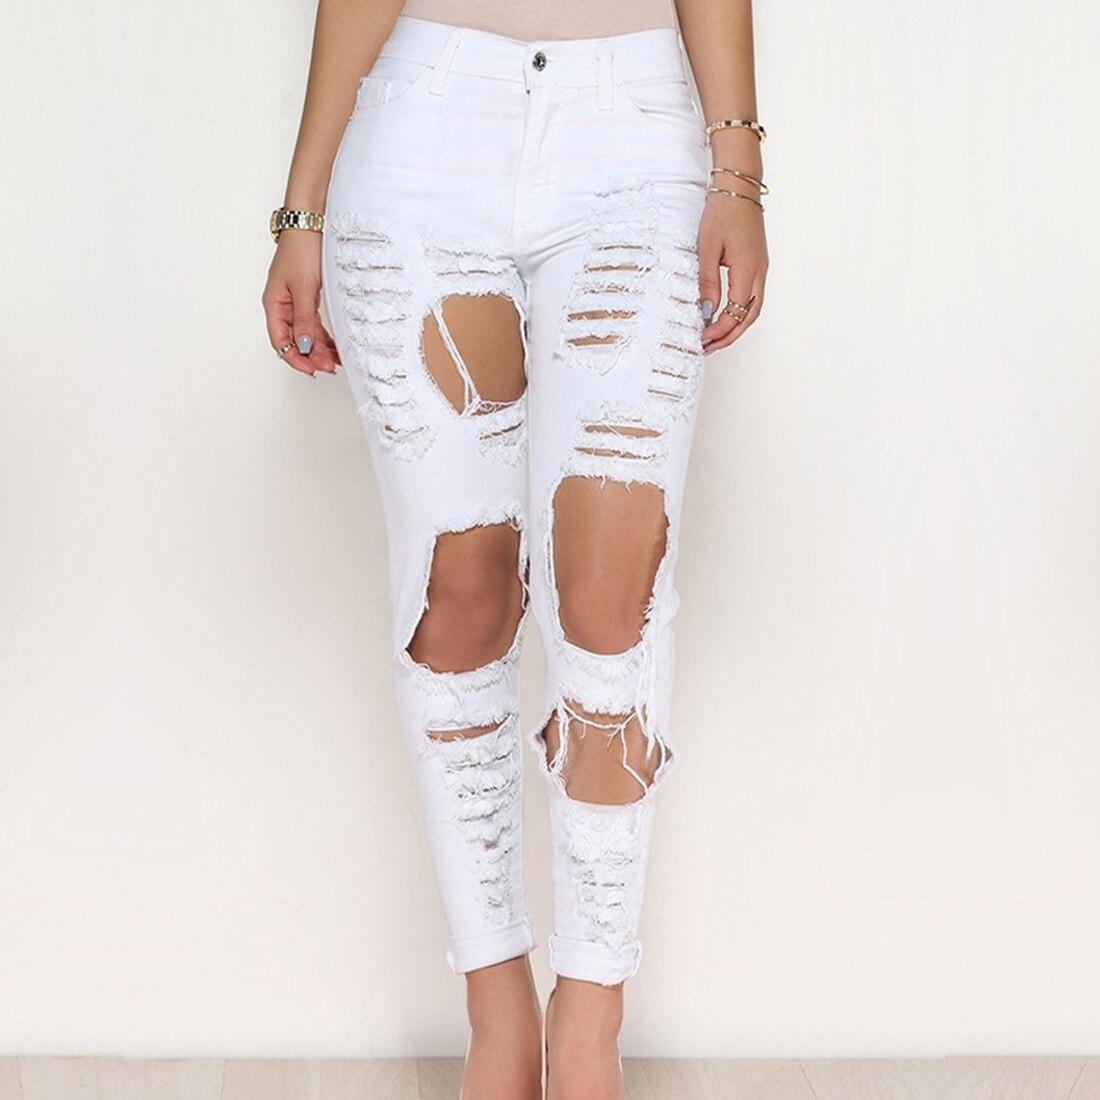 Venta De Pantalones Rotos De Mujer Moda Ideas And Get Free Shipping Ee1n54a3